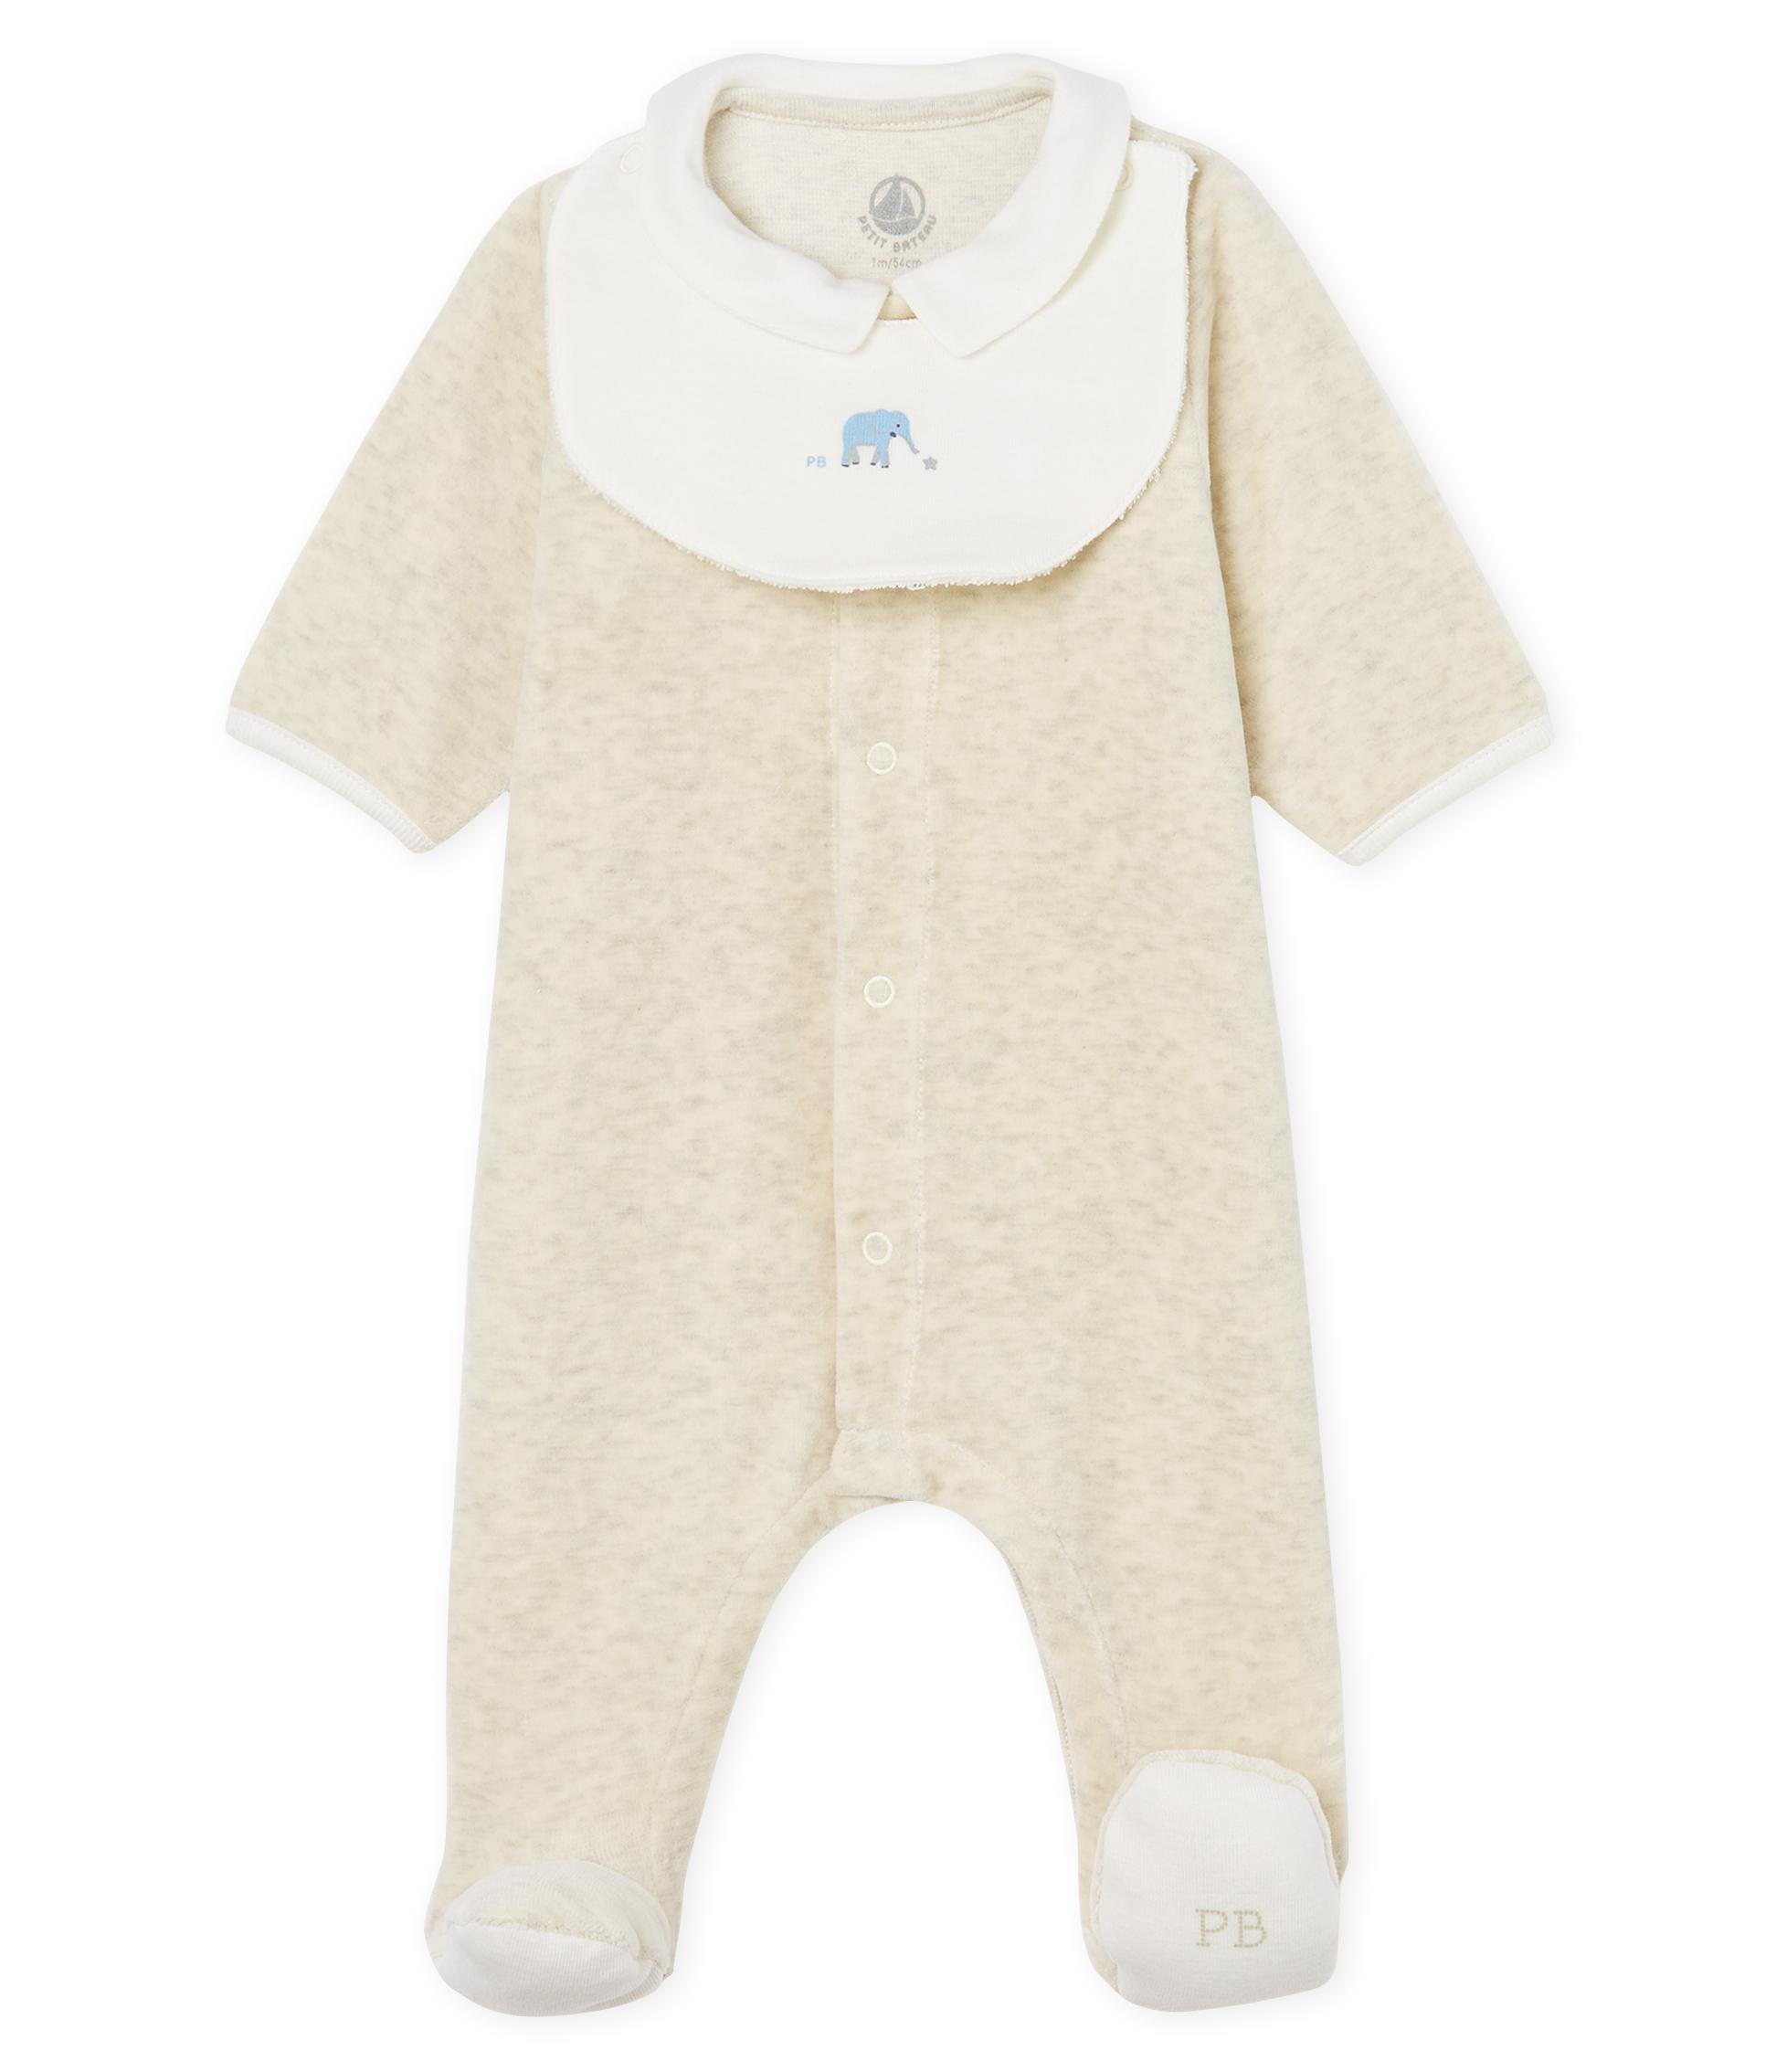 9751bfba5 Unisex baby sleepsuit and bib in cotton velour